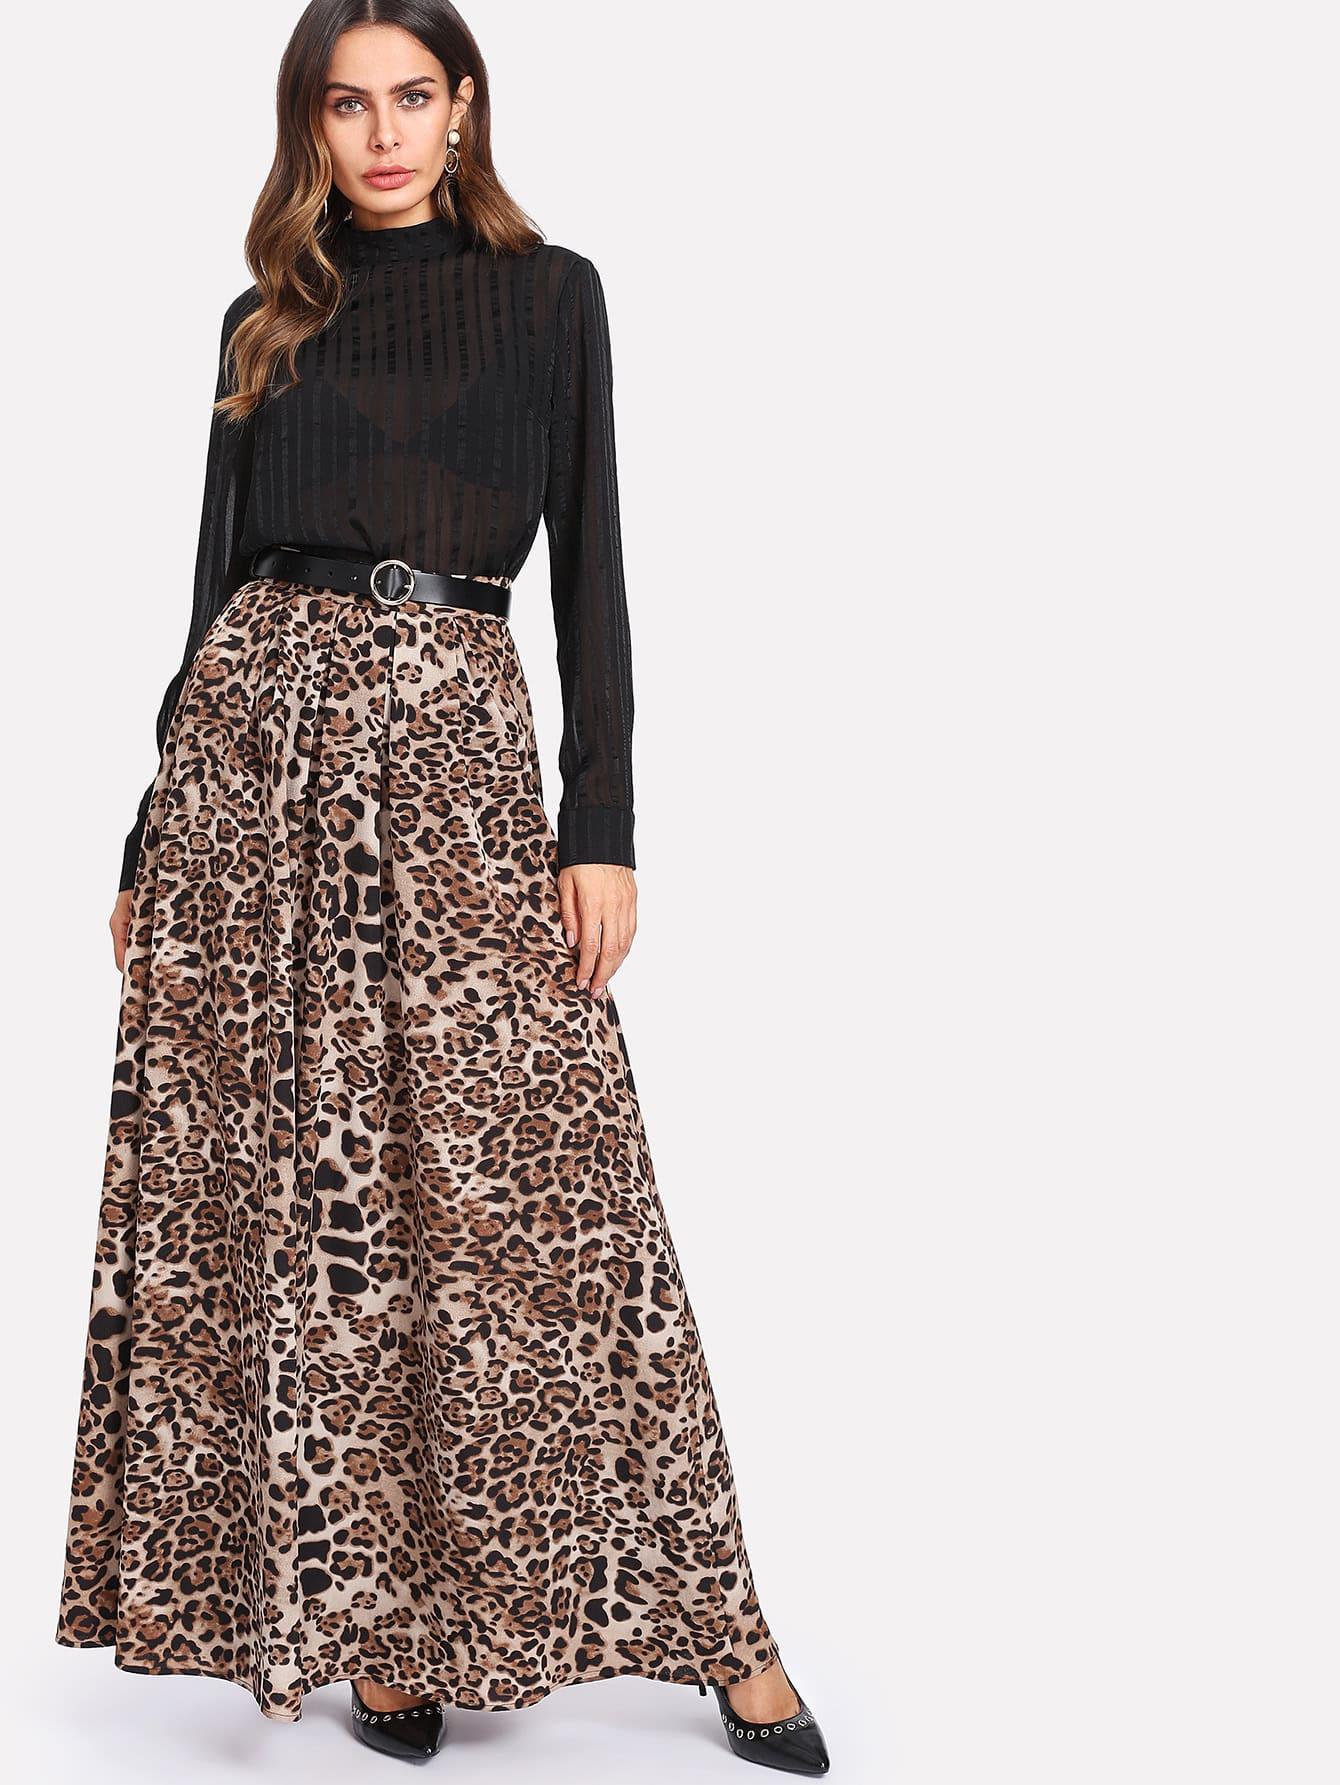 floors elegant collections gown ball floral floor colors long length modesta light skirt hijab multiple e skirts